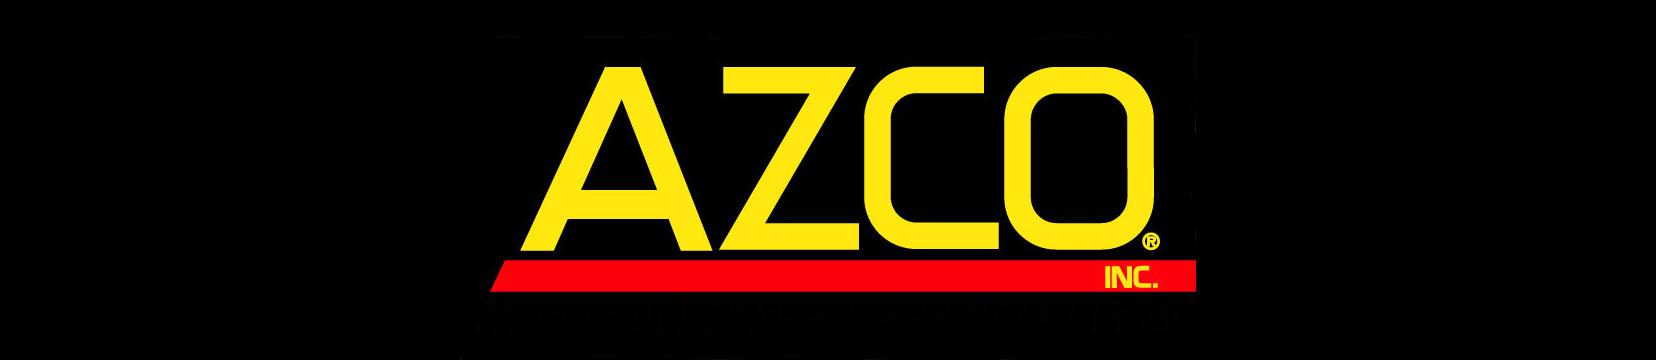 Local Success: AZCO INC.